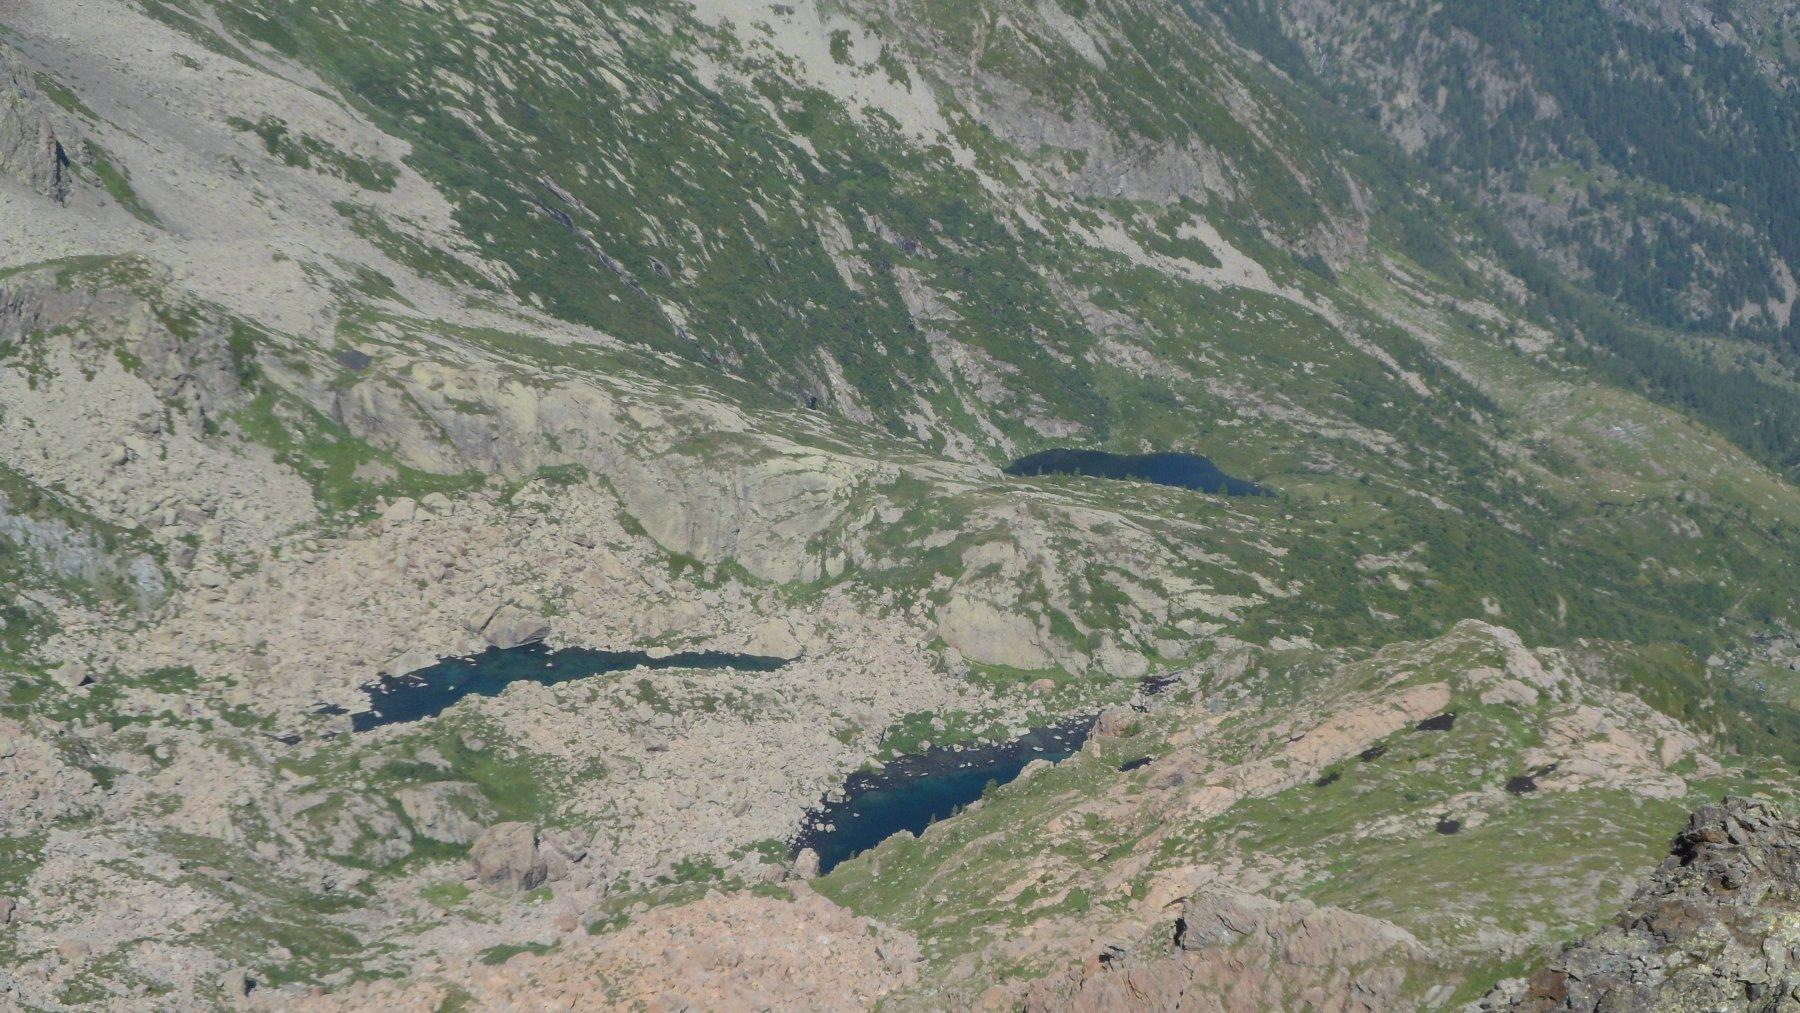 Laghi Verdi e lago Paschiet da cima Chiavesso